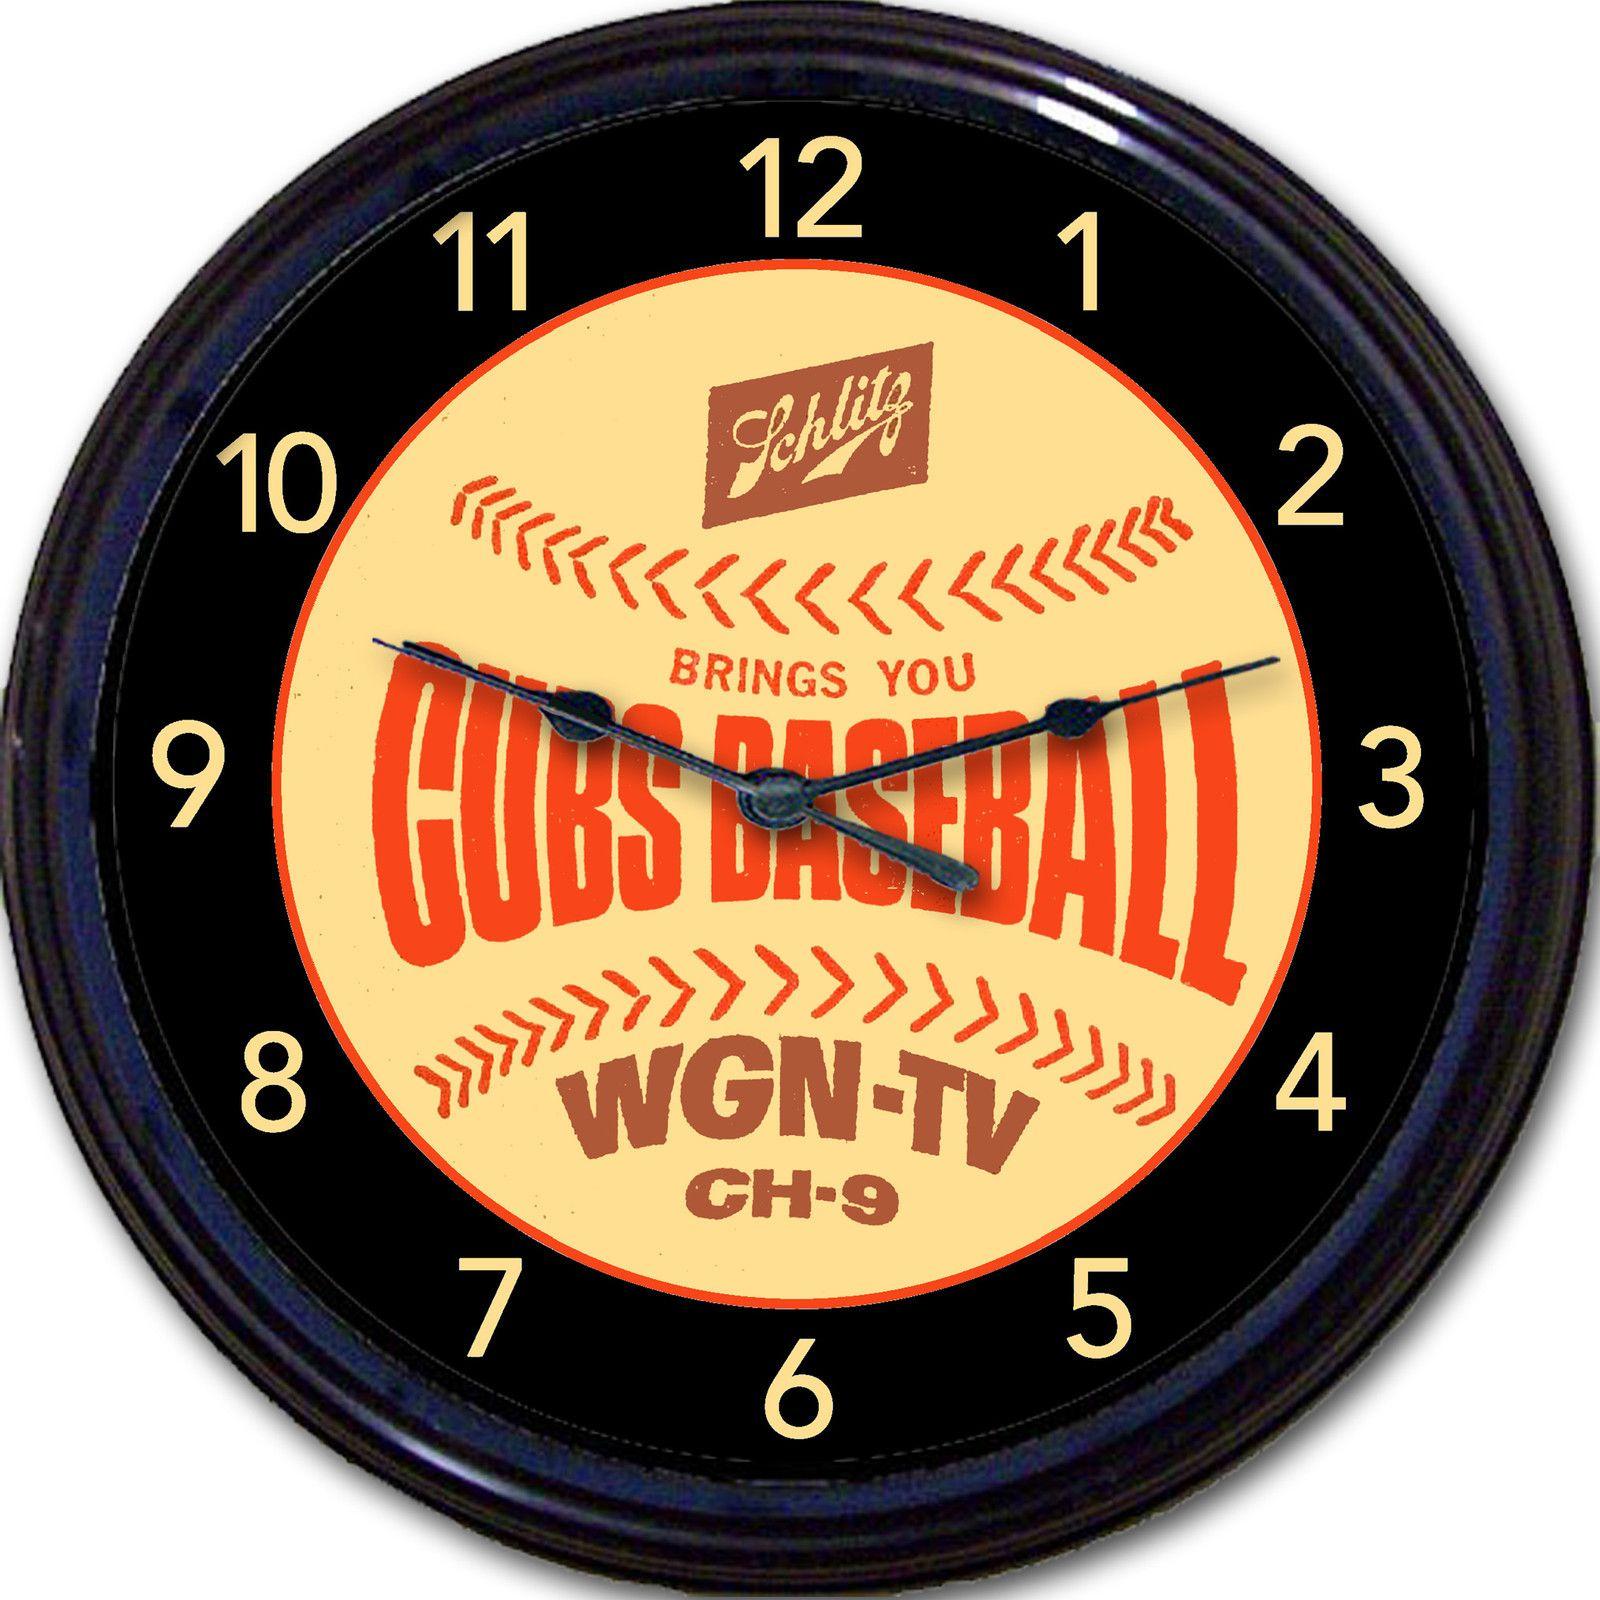 Schlitz/Cubs Beer Clock! Great!   Chicago Cubs Man Cave Art ...